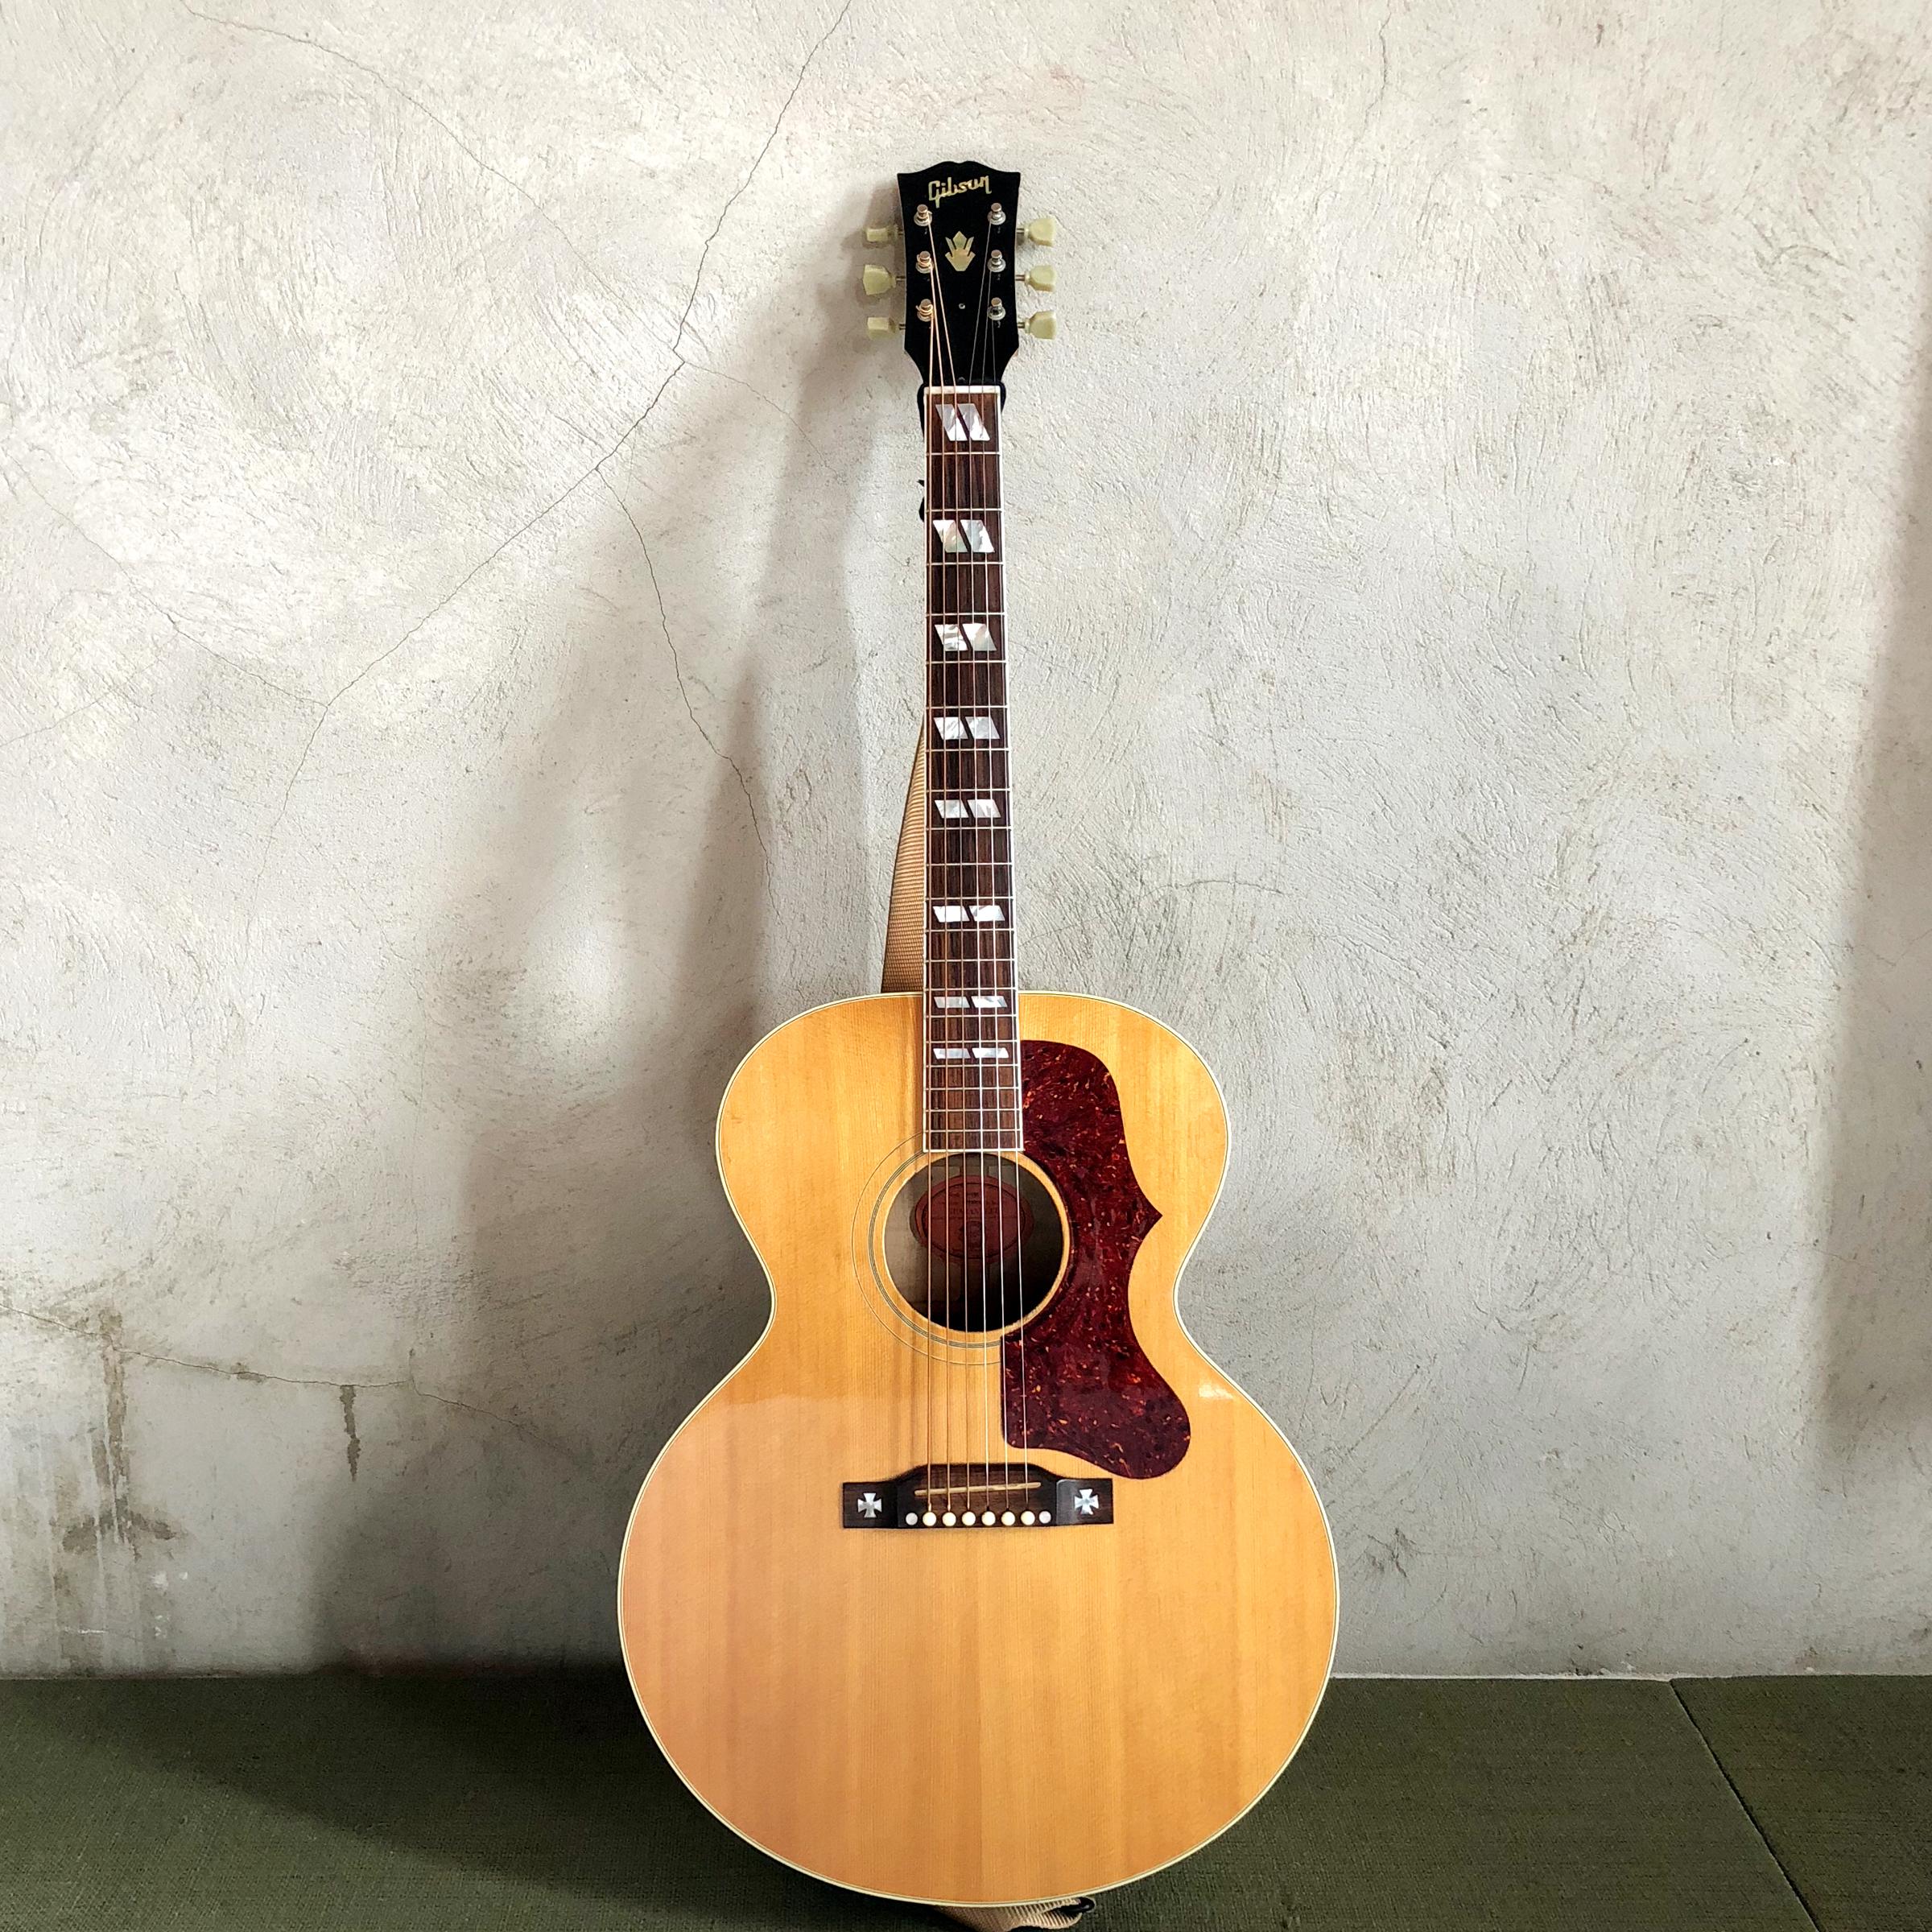 2001 Gibson J-185